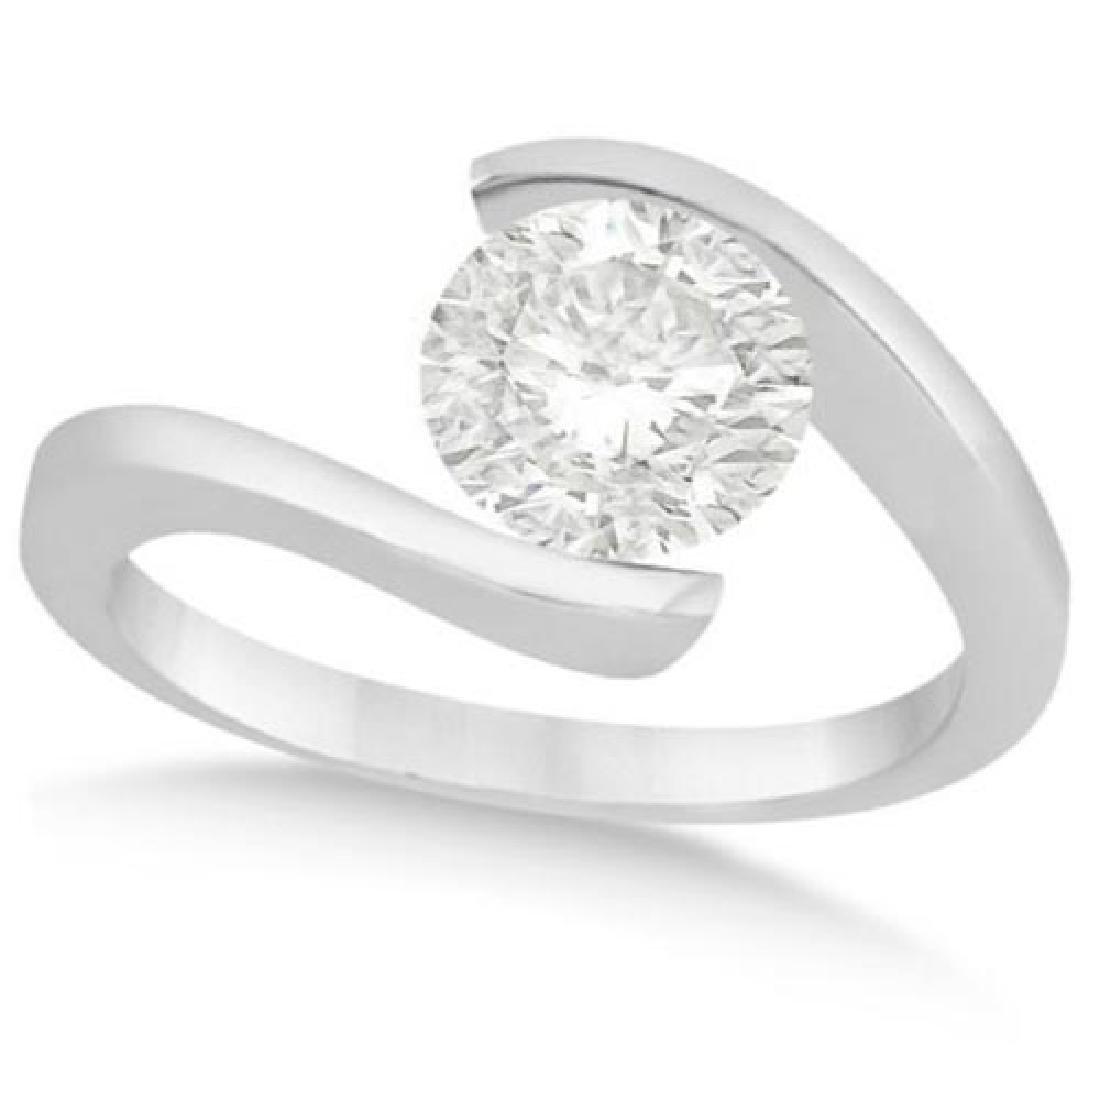 Tension Set Solitaire Diamond Engagement Ring 14k White